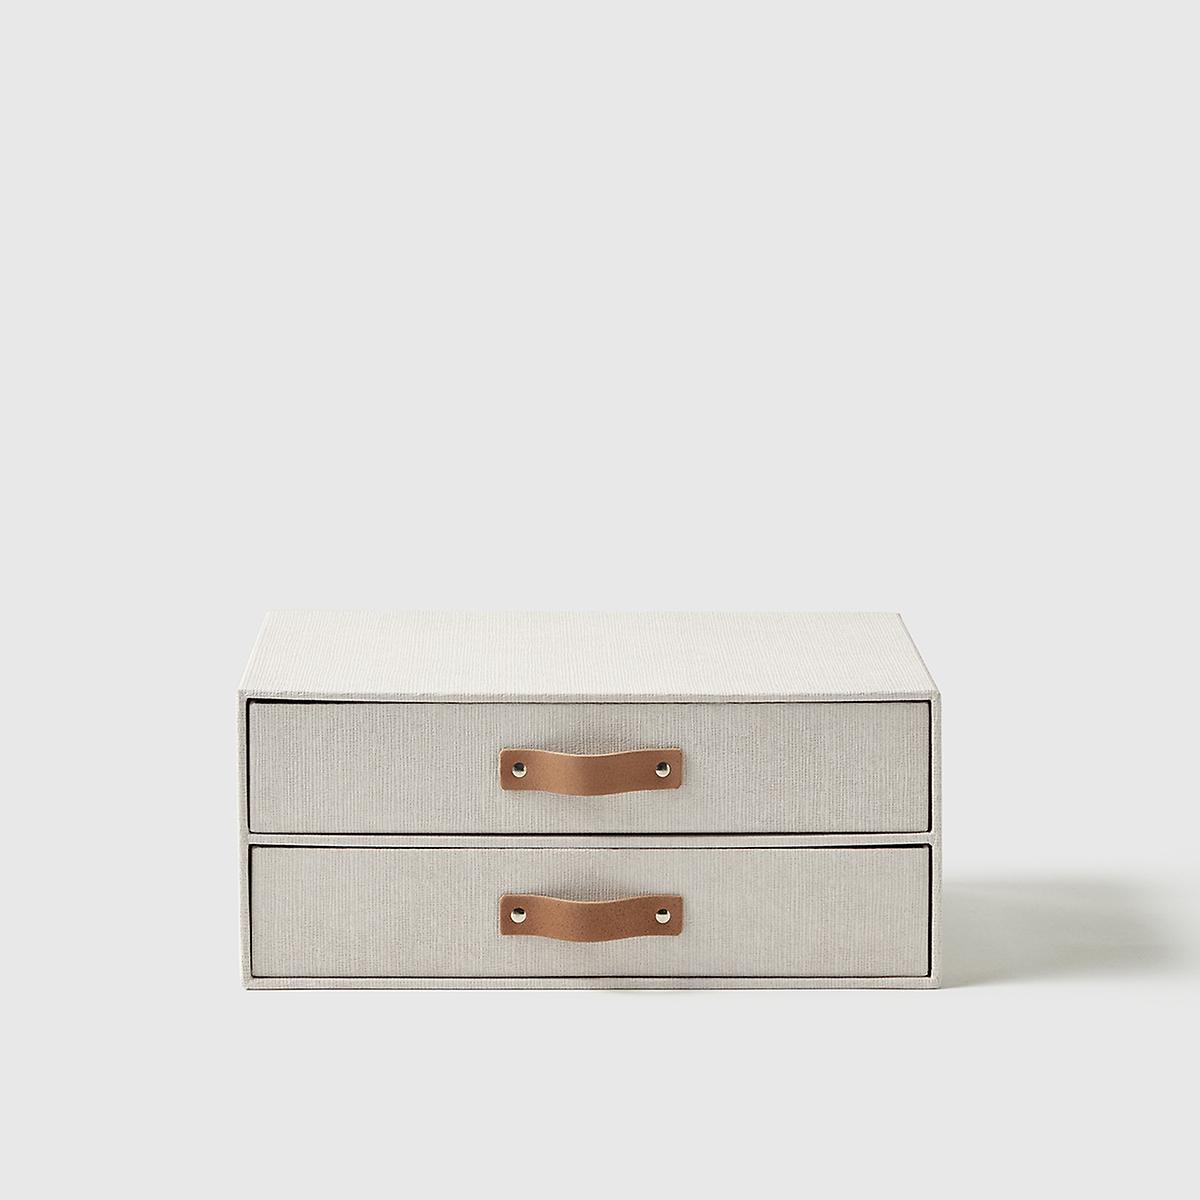 Marie Kondo Calm Paper Drawers